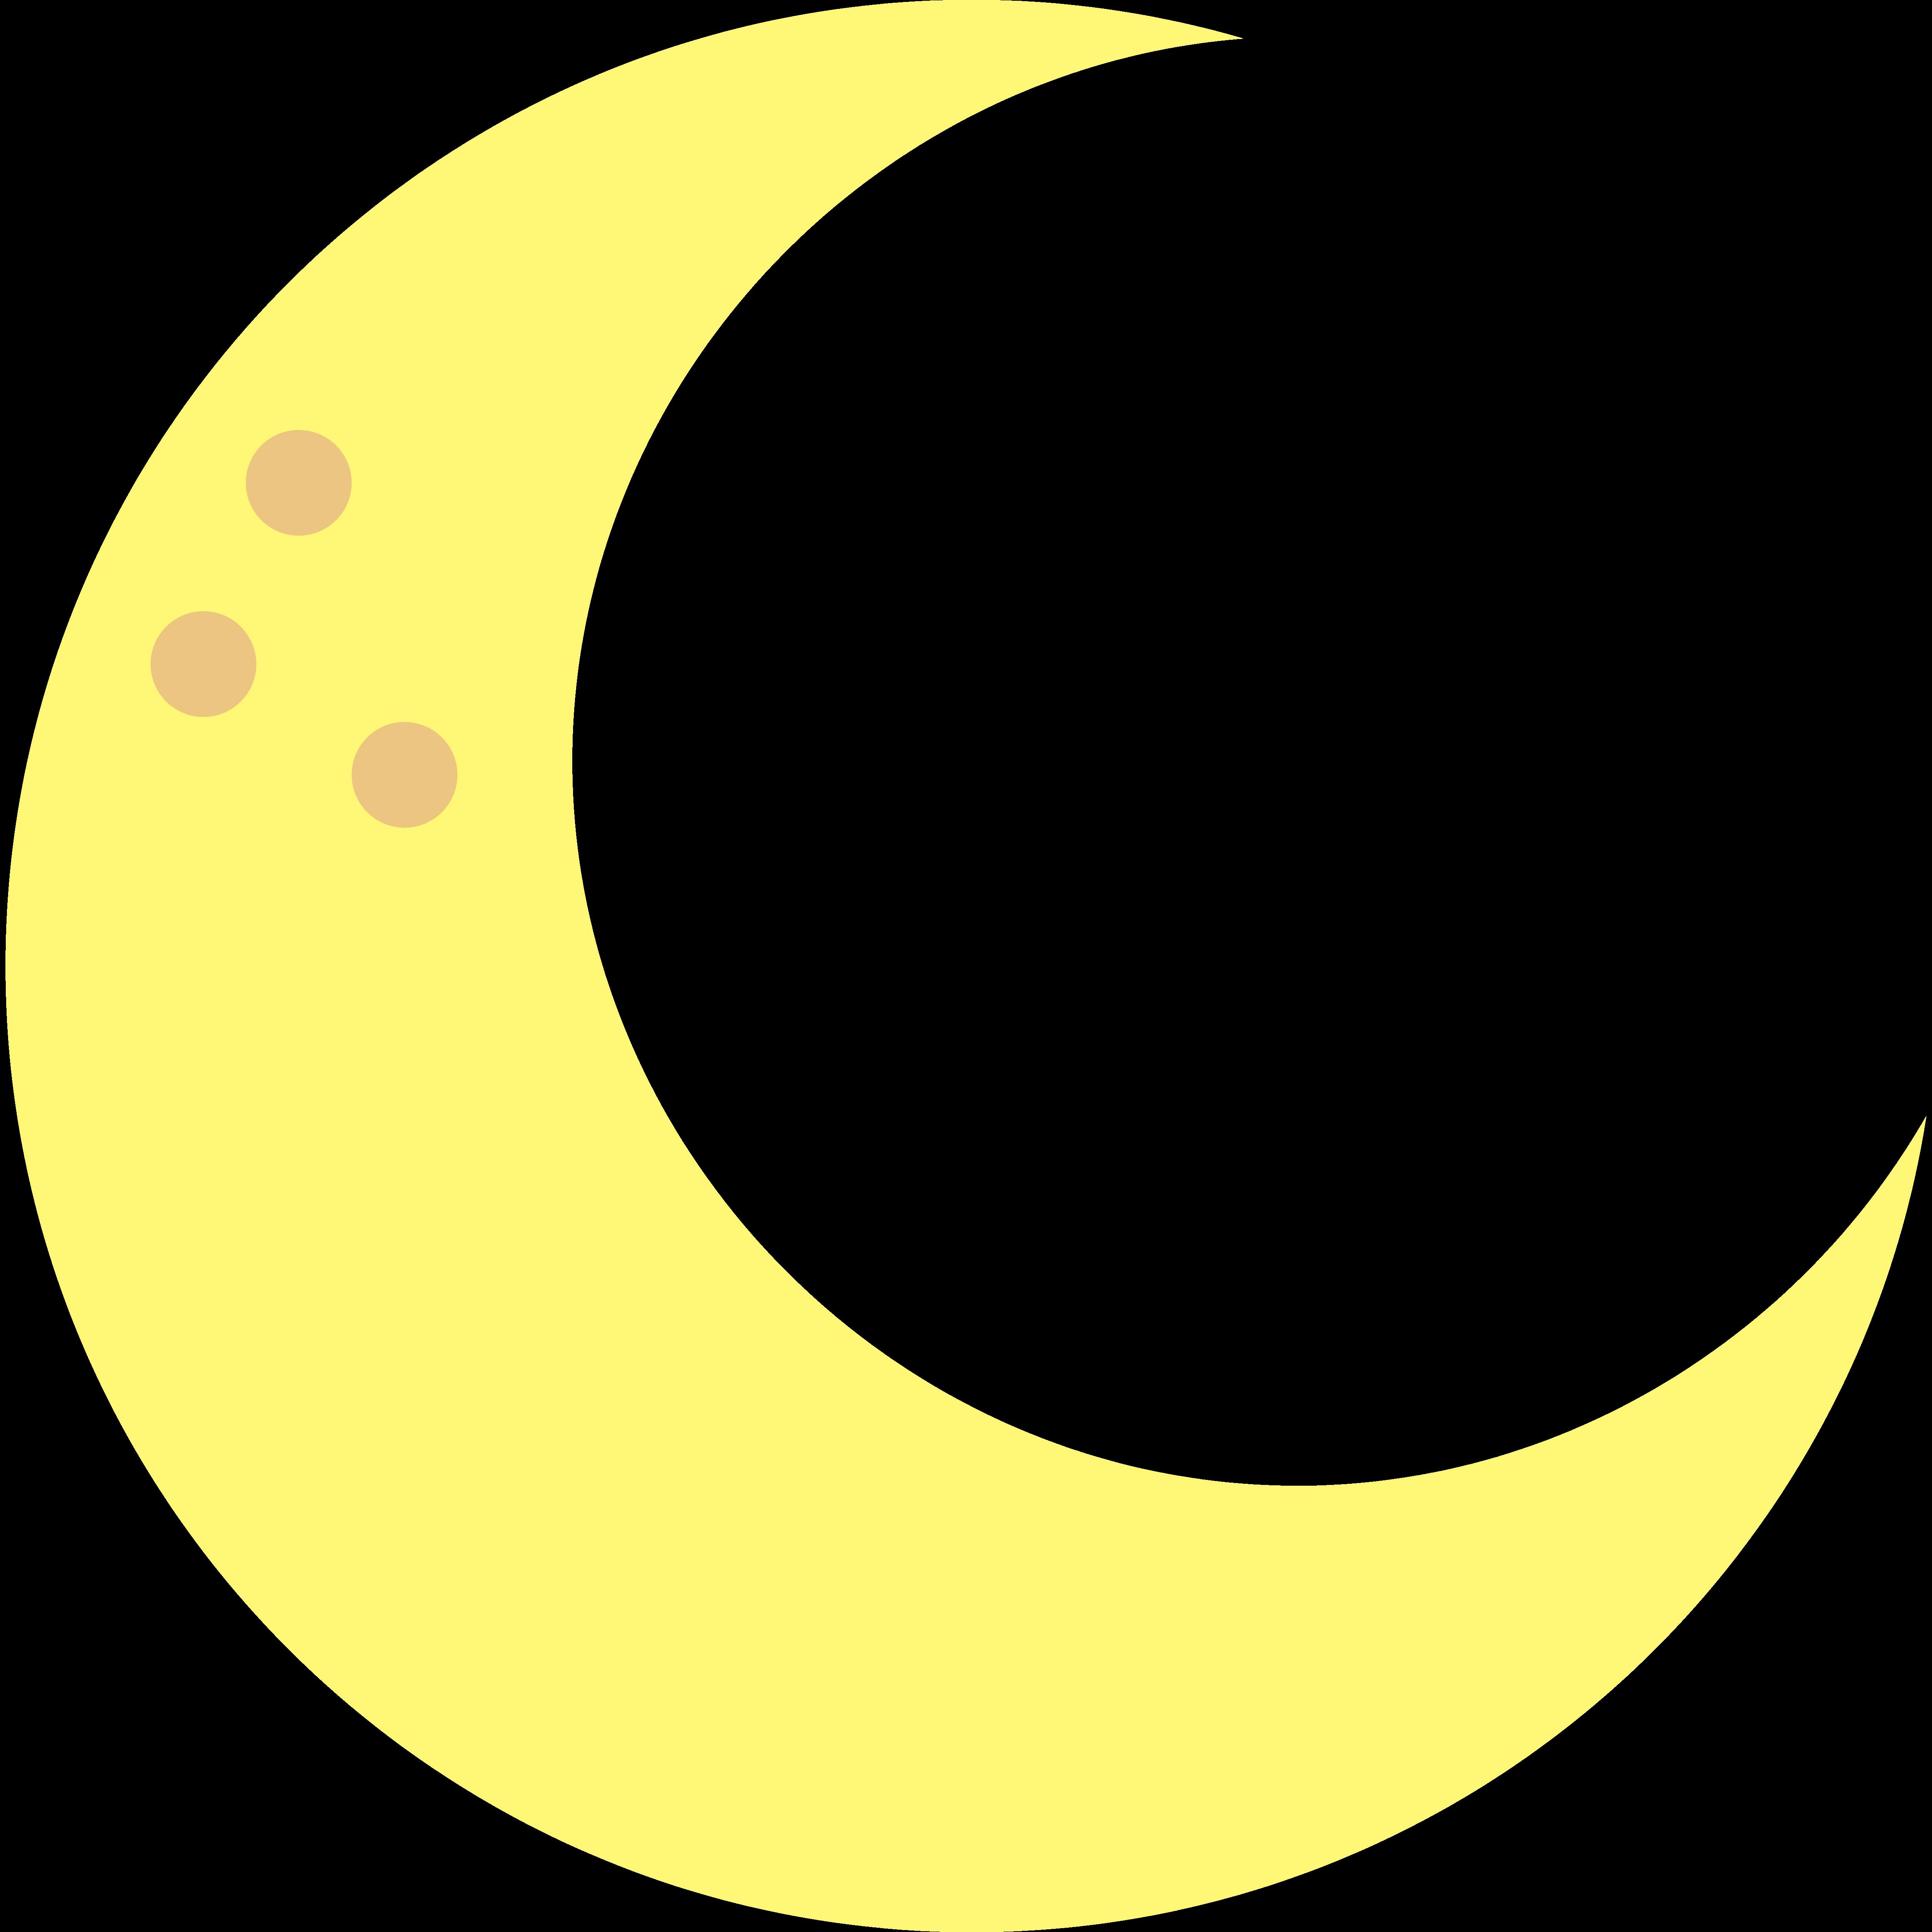 10 Transparent Moon Clipart PNG Images